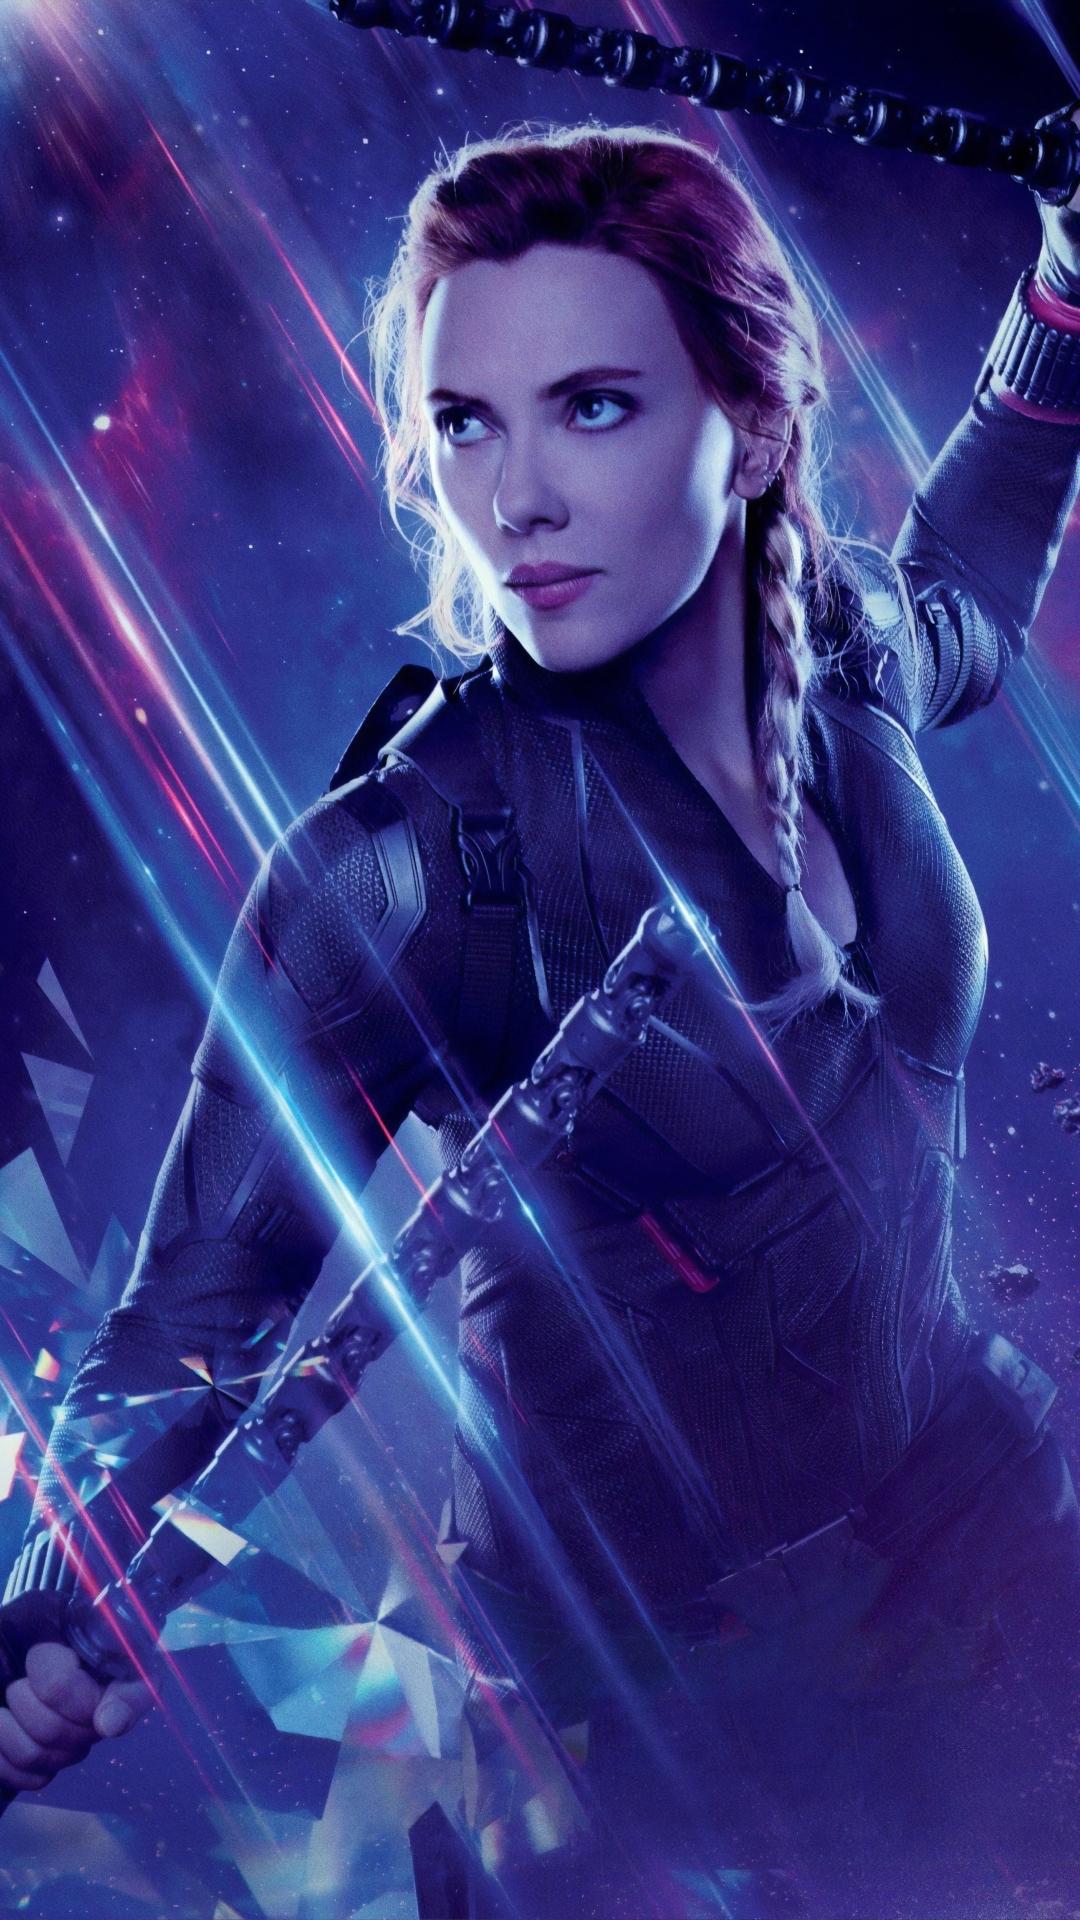 1080x1920 Black Widow in Avengers Endgame Iphone 7, 6s, 6 ...